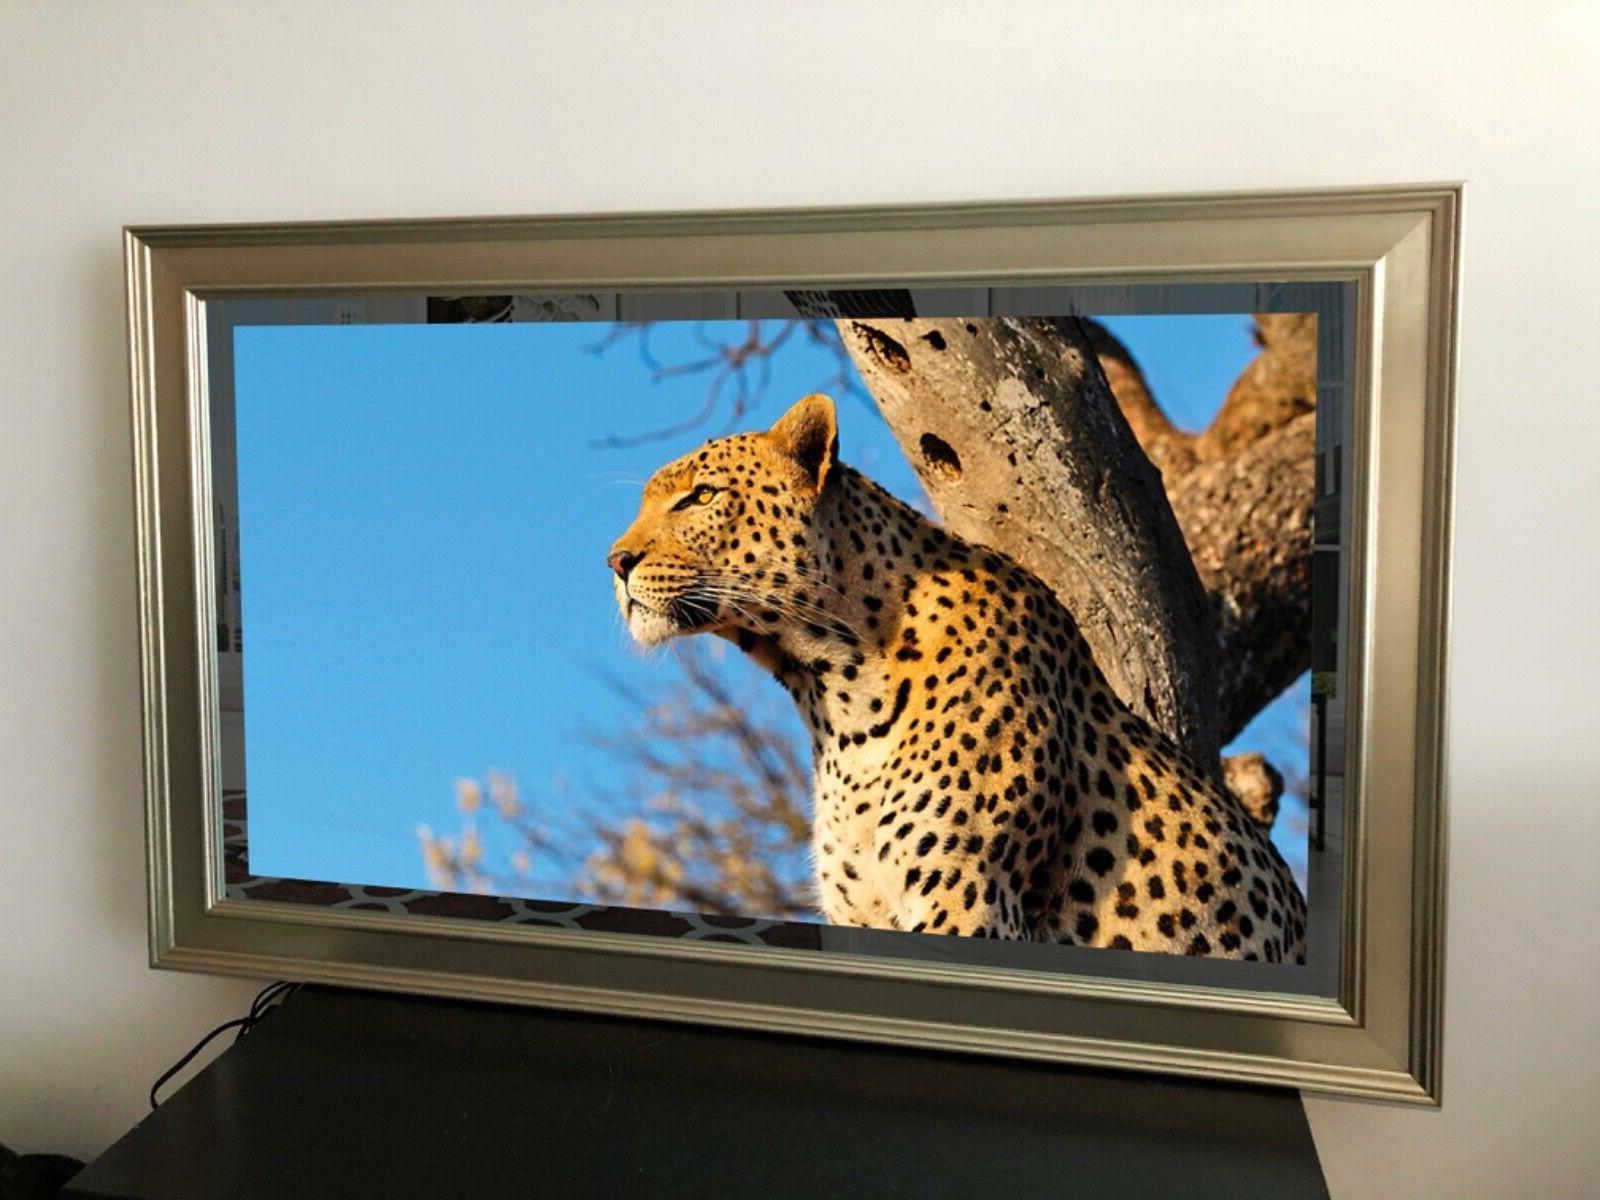 mirror tv 50 smart 4ktv silver gold